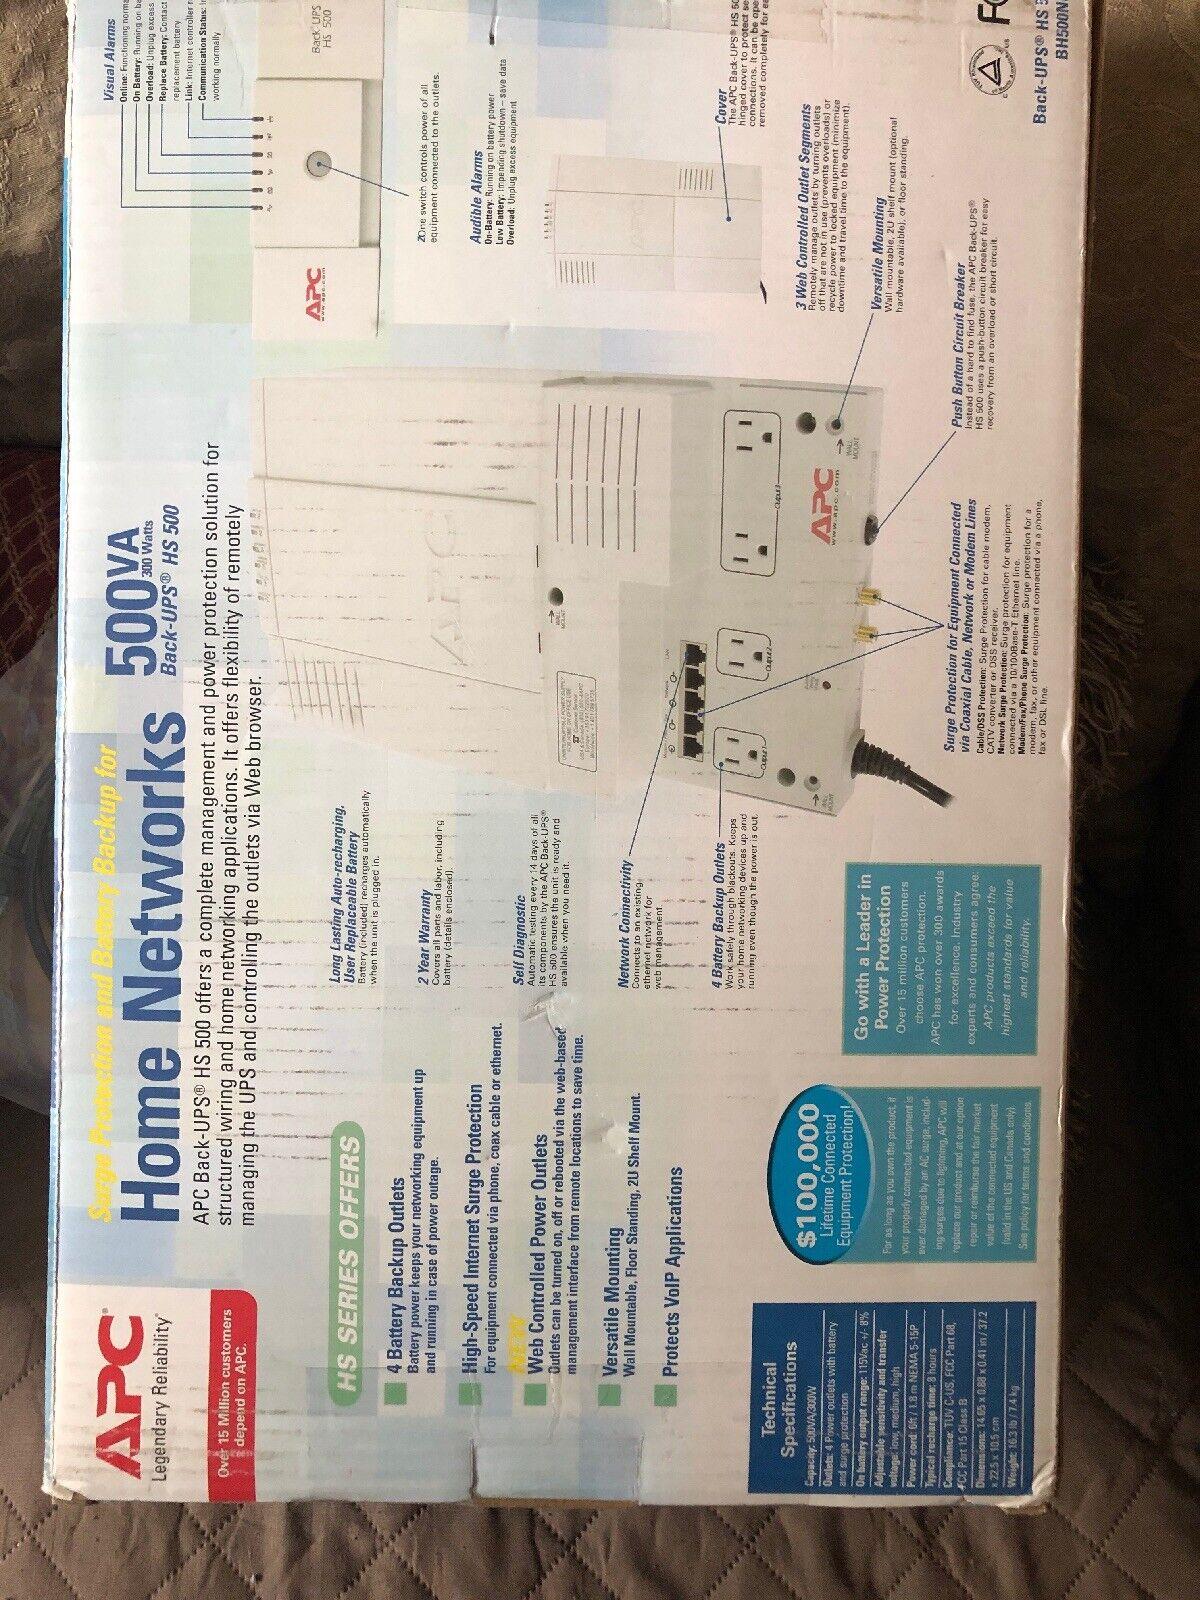 APC Back-UPS HS 500VA ups Uninterruptible Power Supply, Output, 300W,